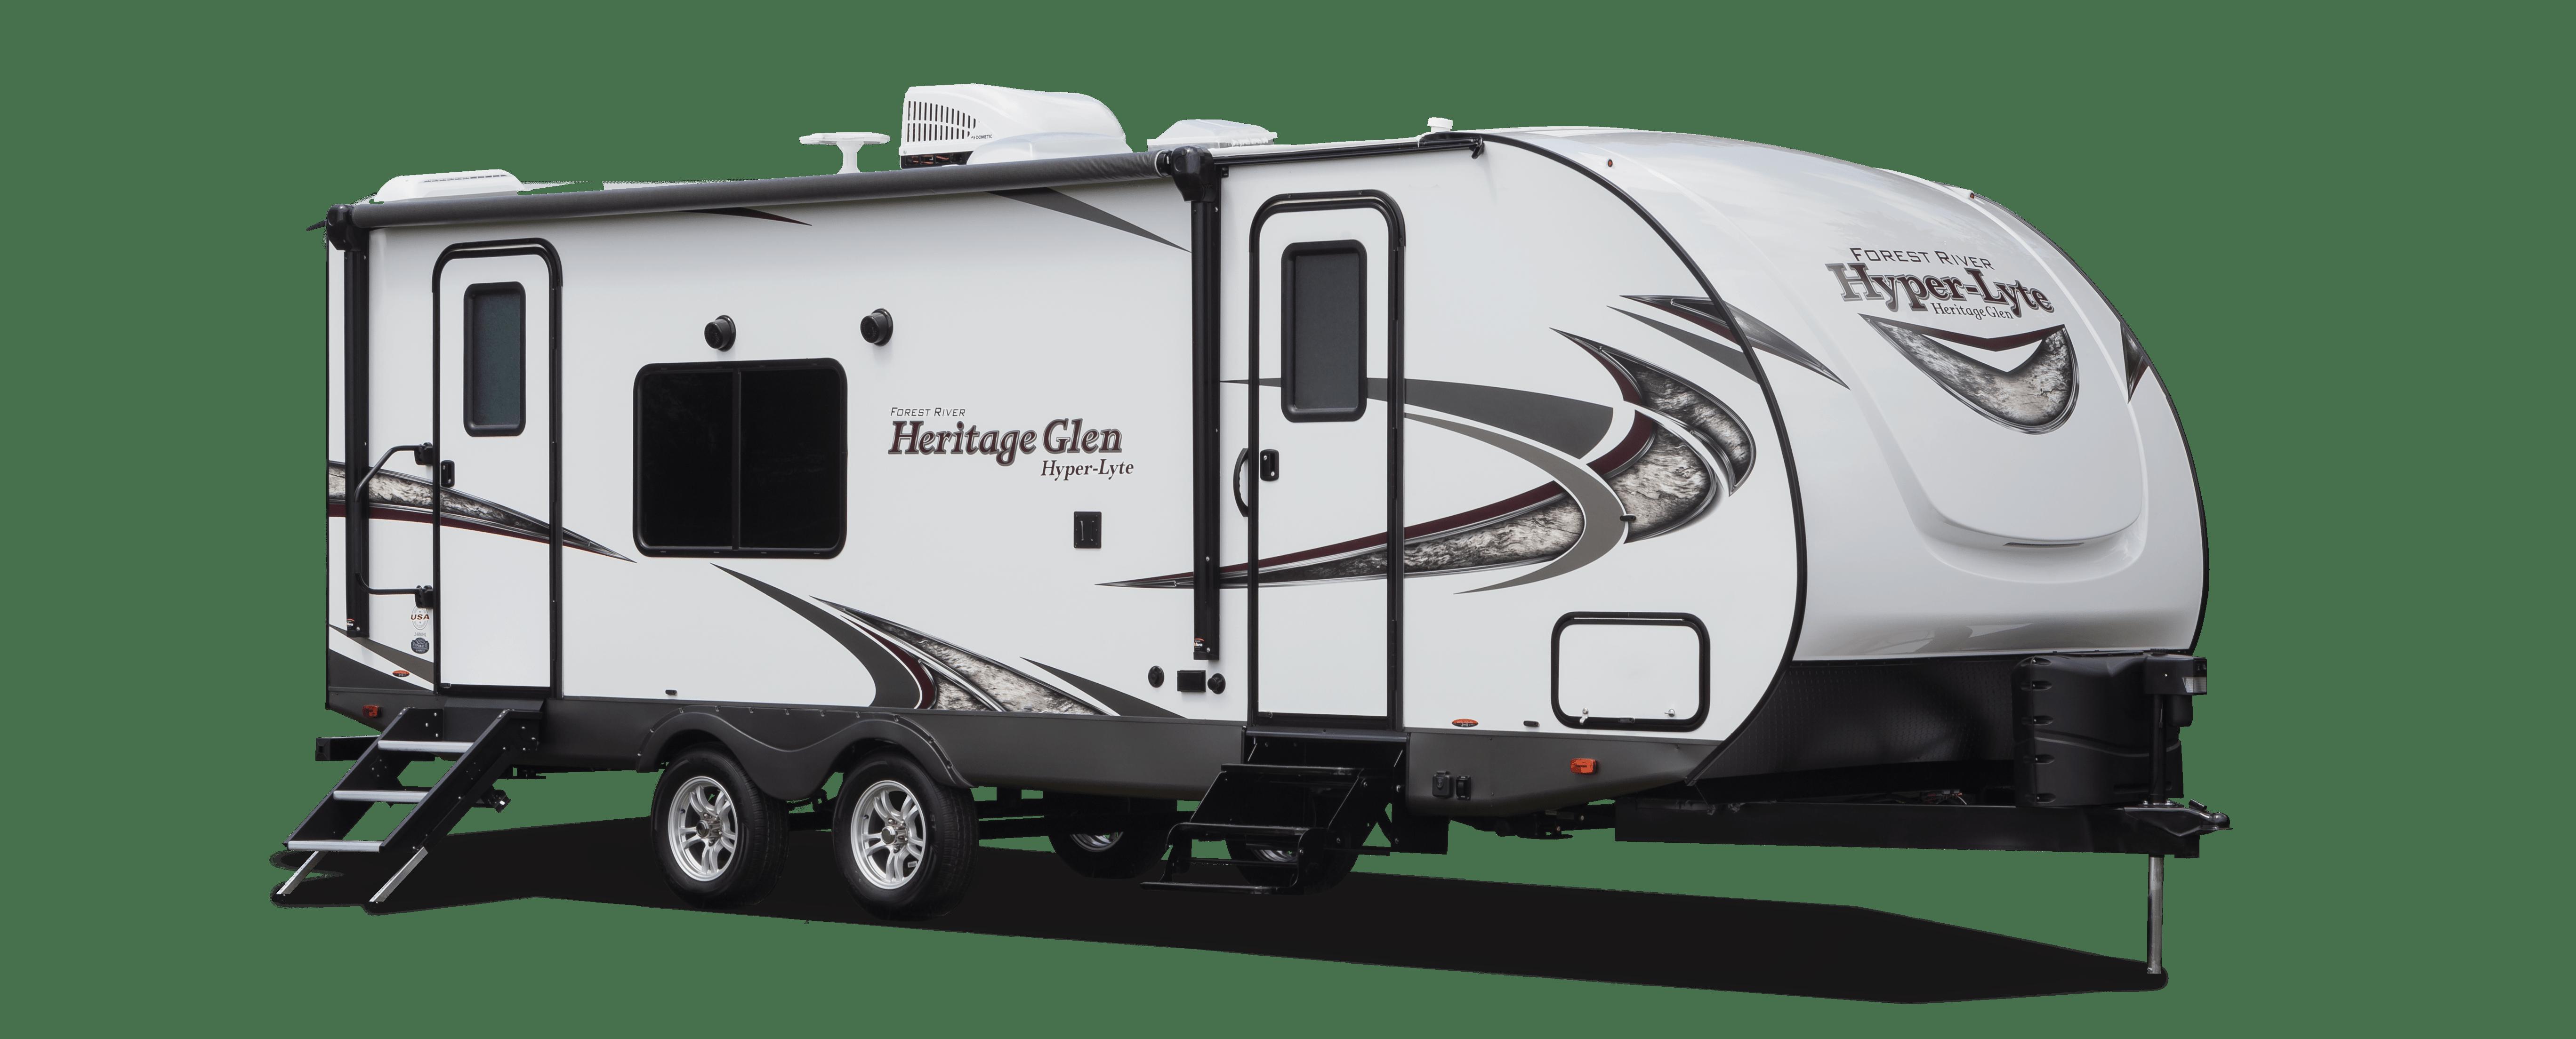 Heritage Glen Travel Trailer